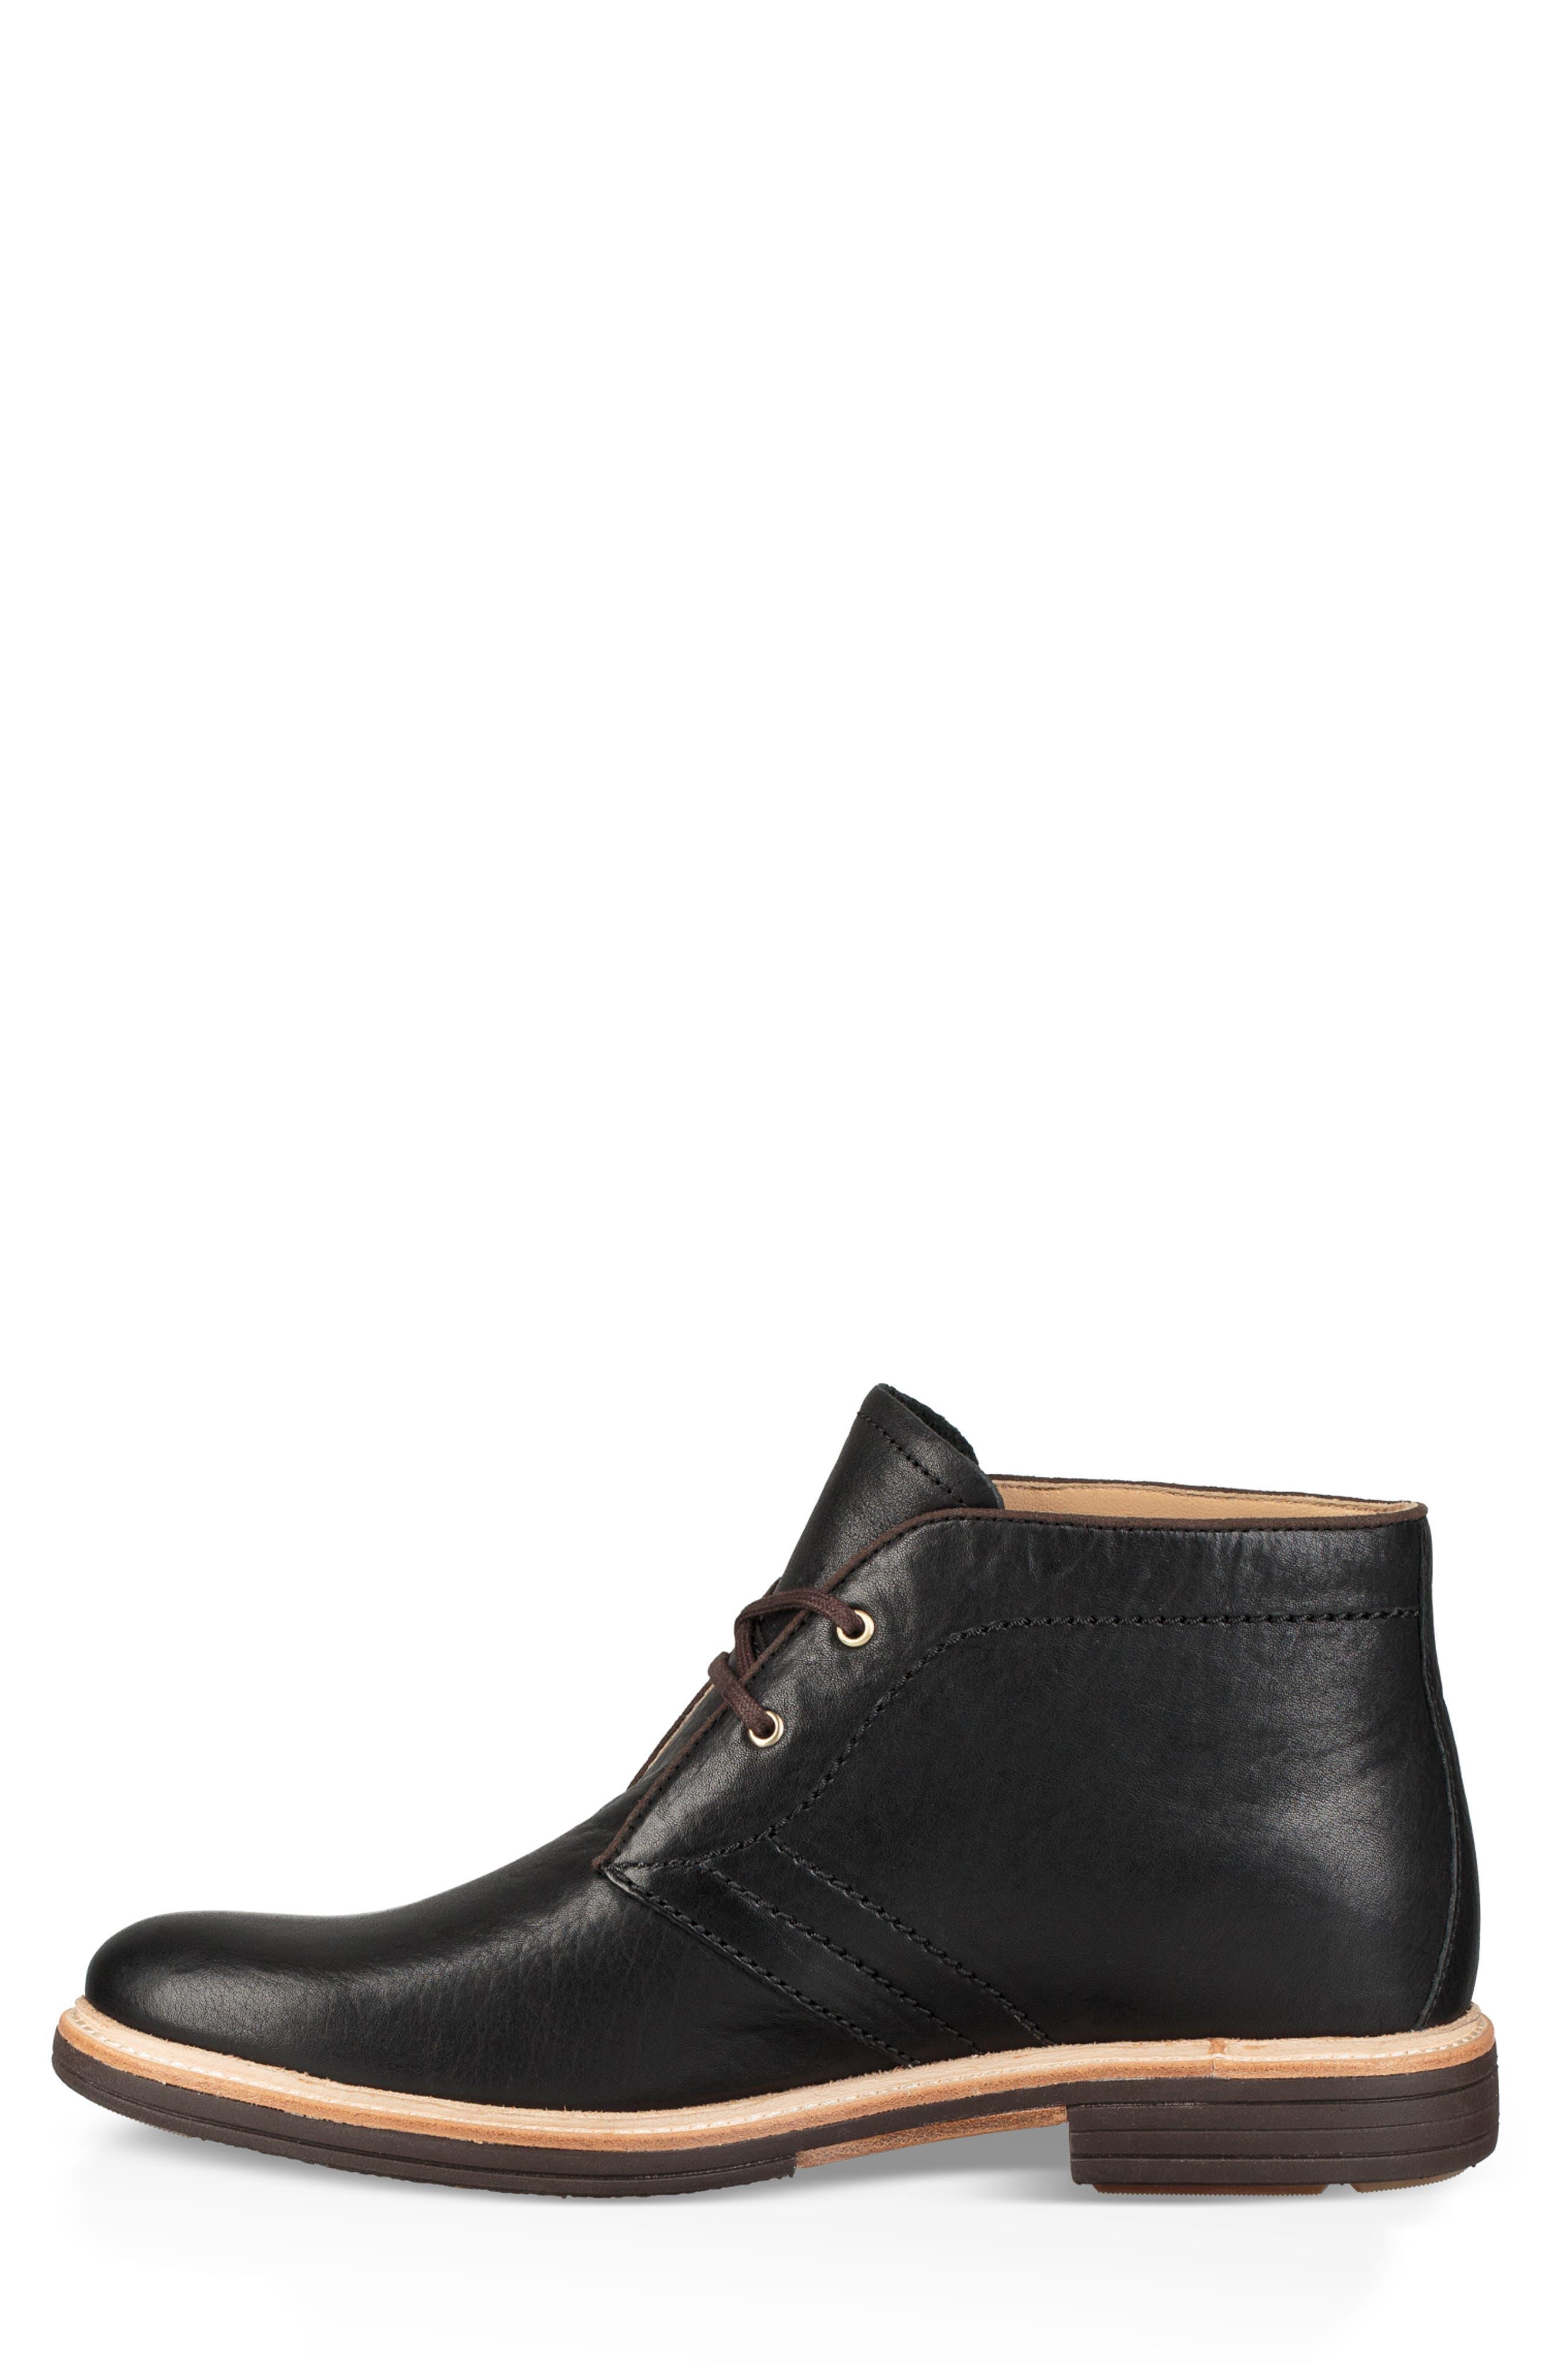 Australia Dagmann Chukka Boot,                             Alternate thumbnail 3, color,                             BLACK LEATHER/SUEDE